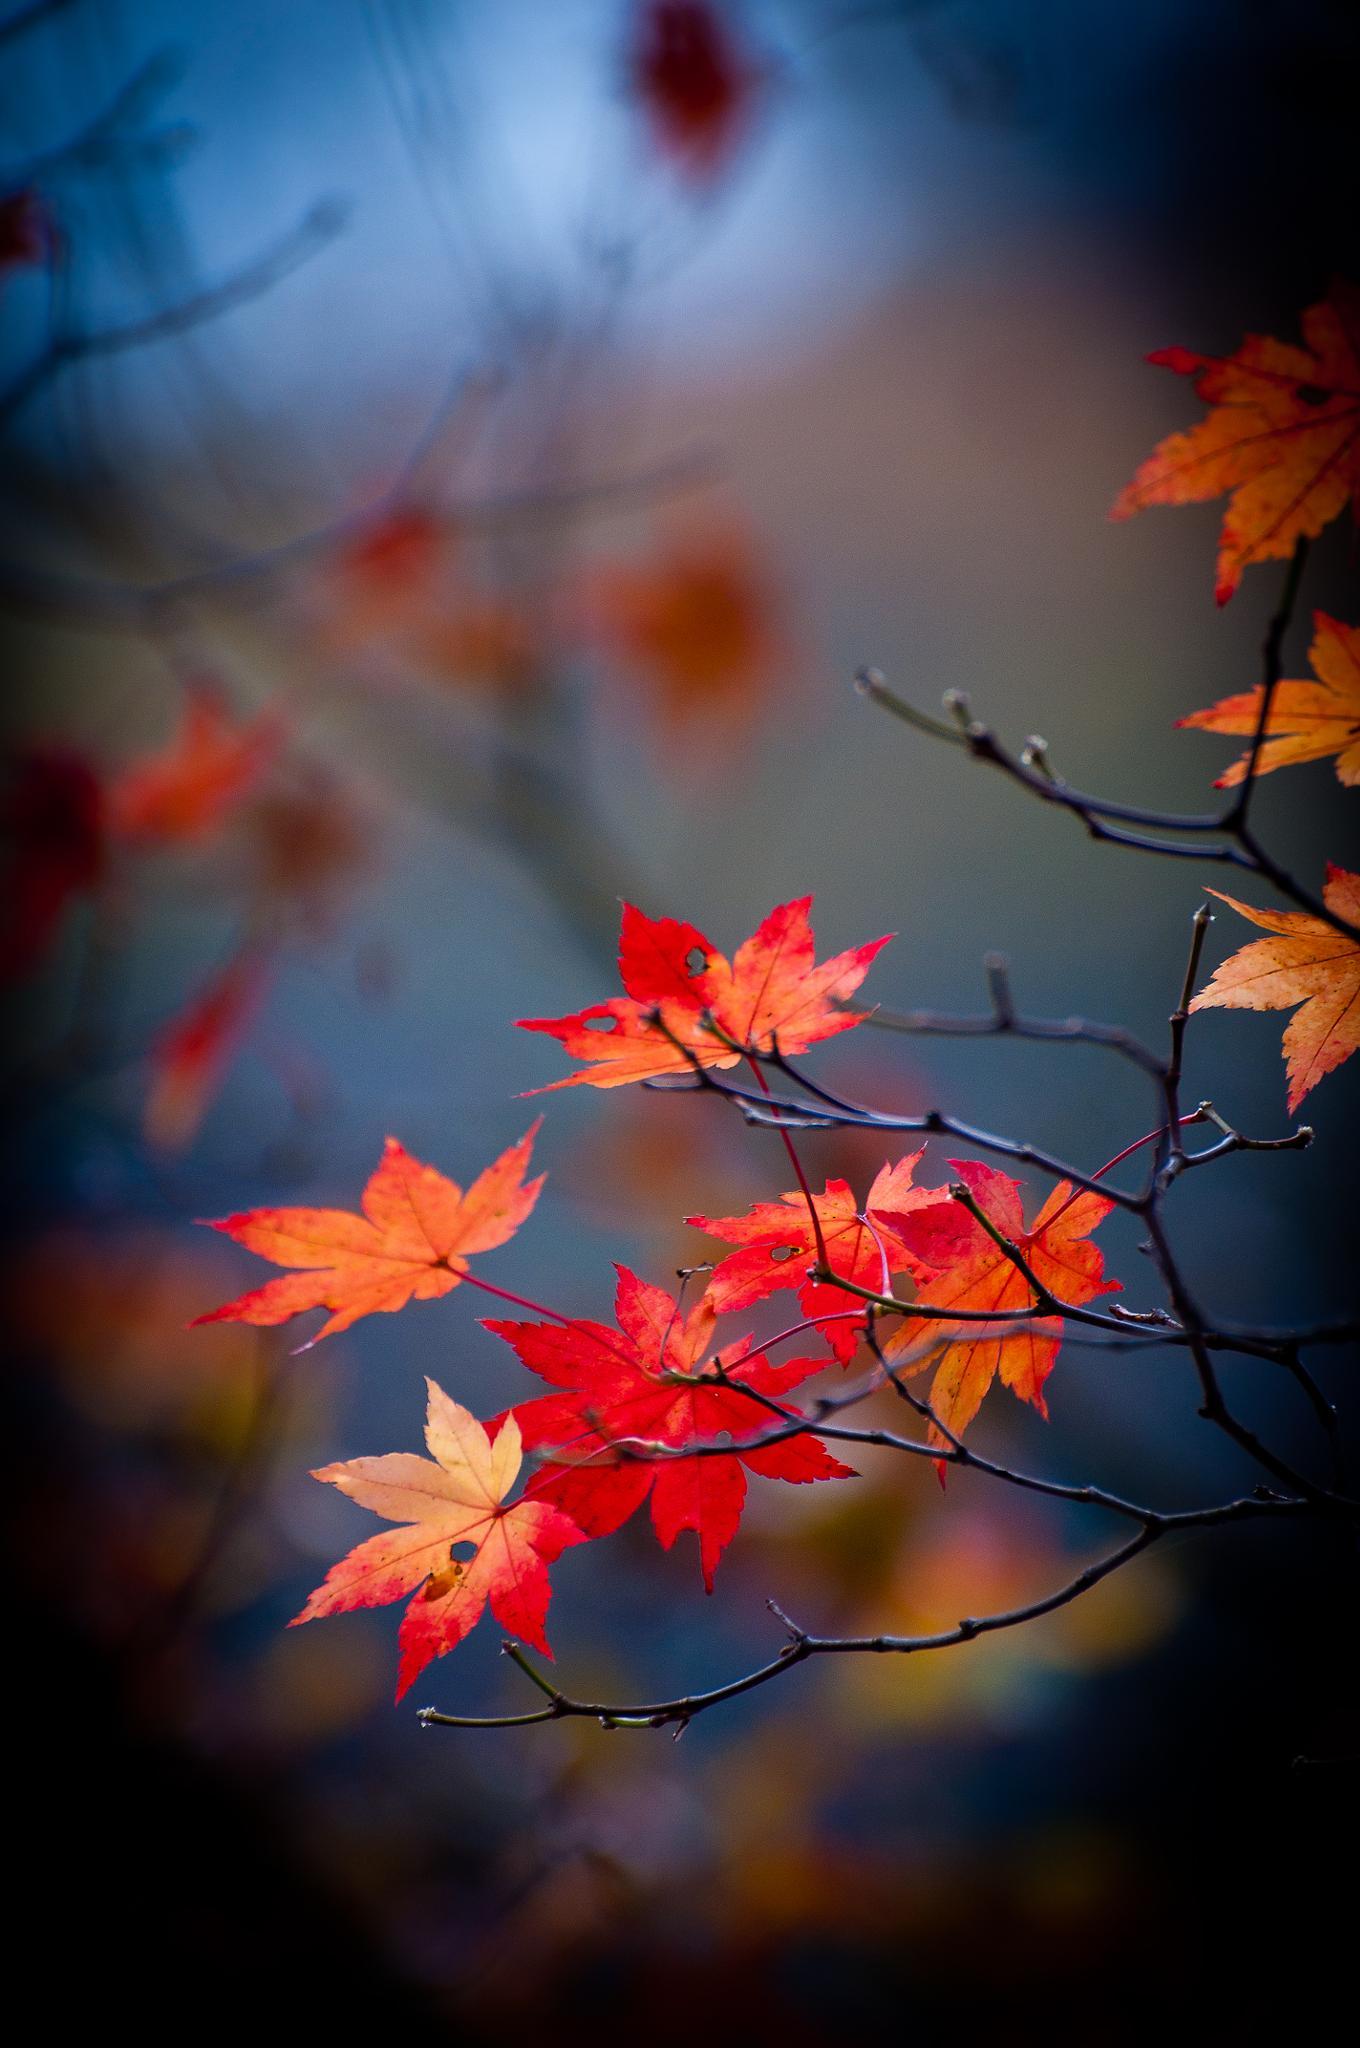 Maples of Korea by Lee Jiun Jye